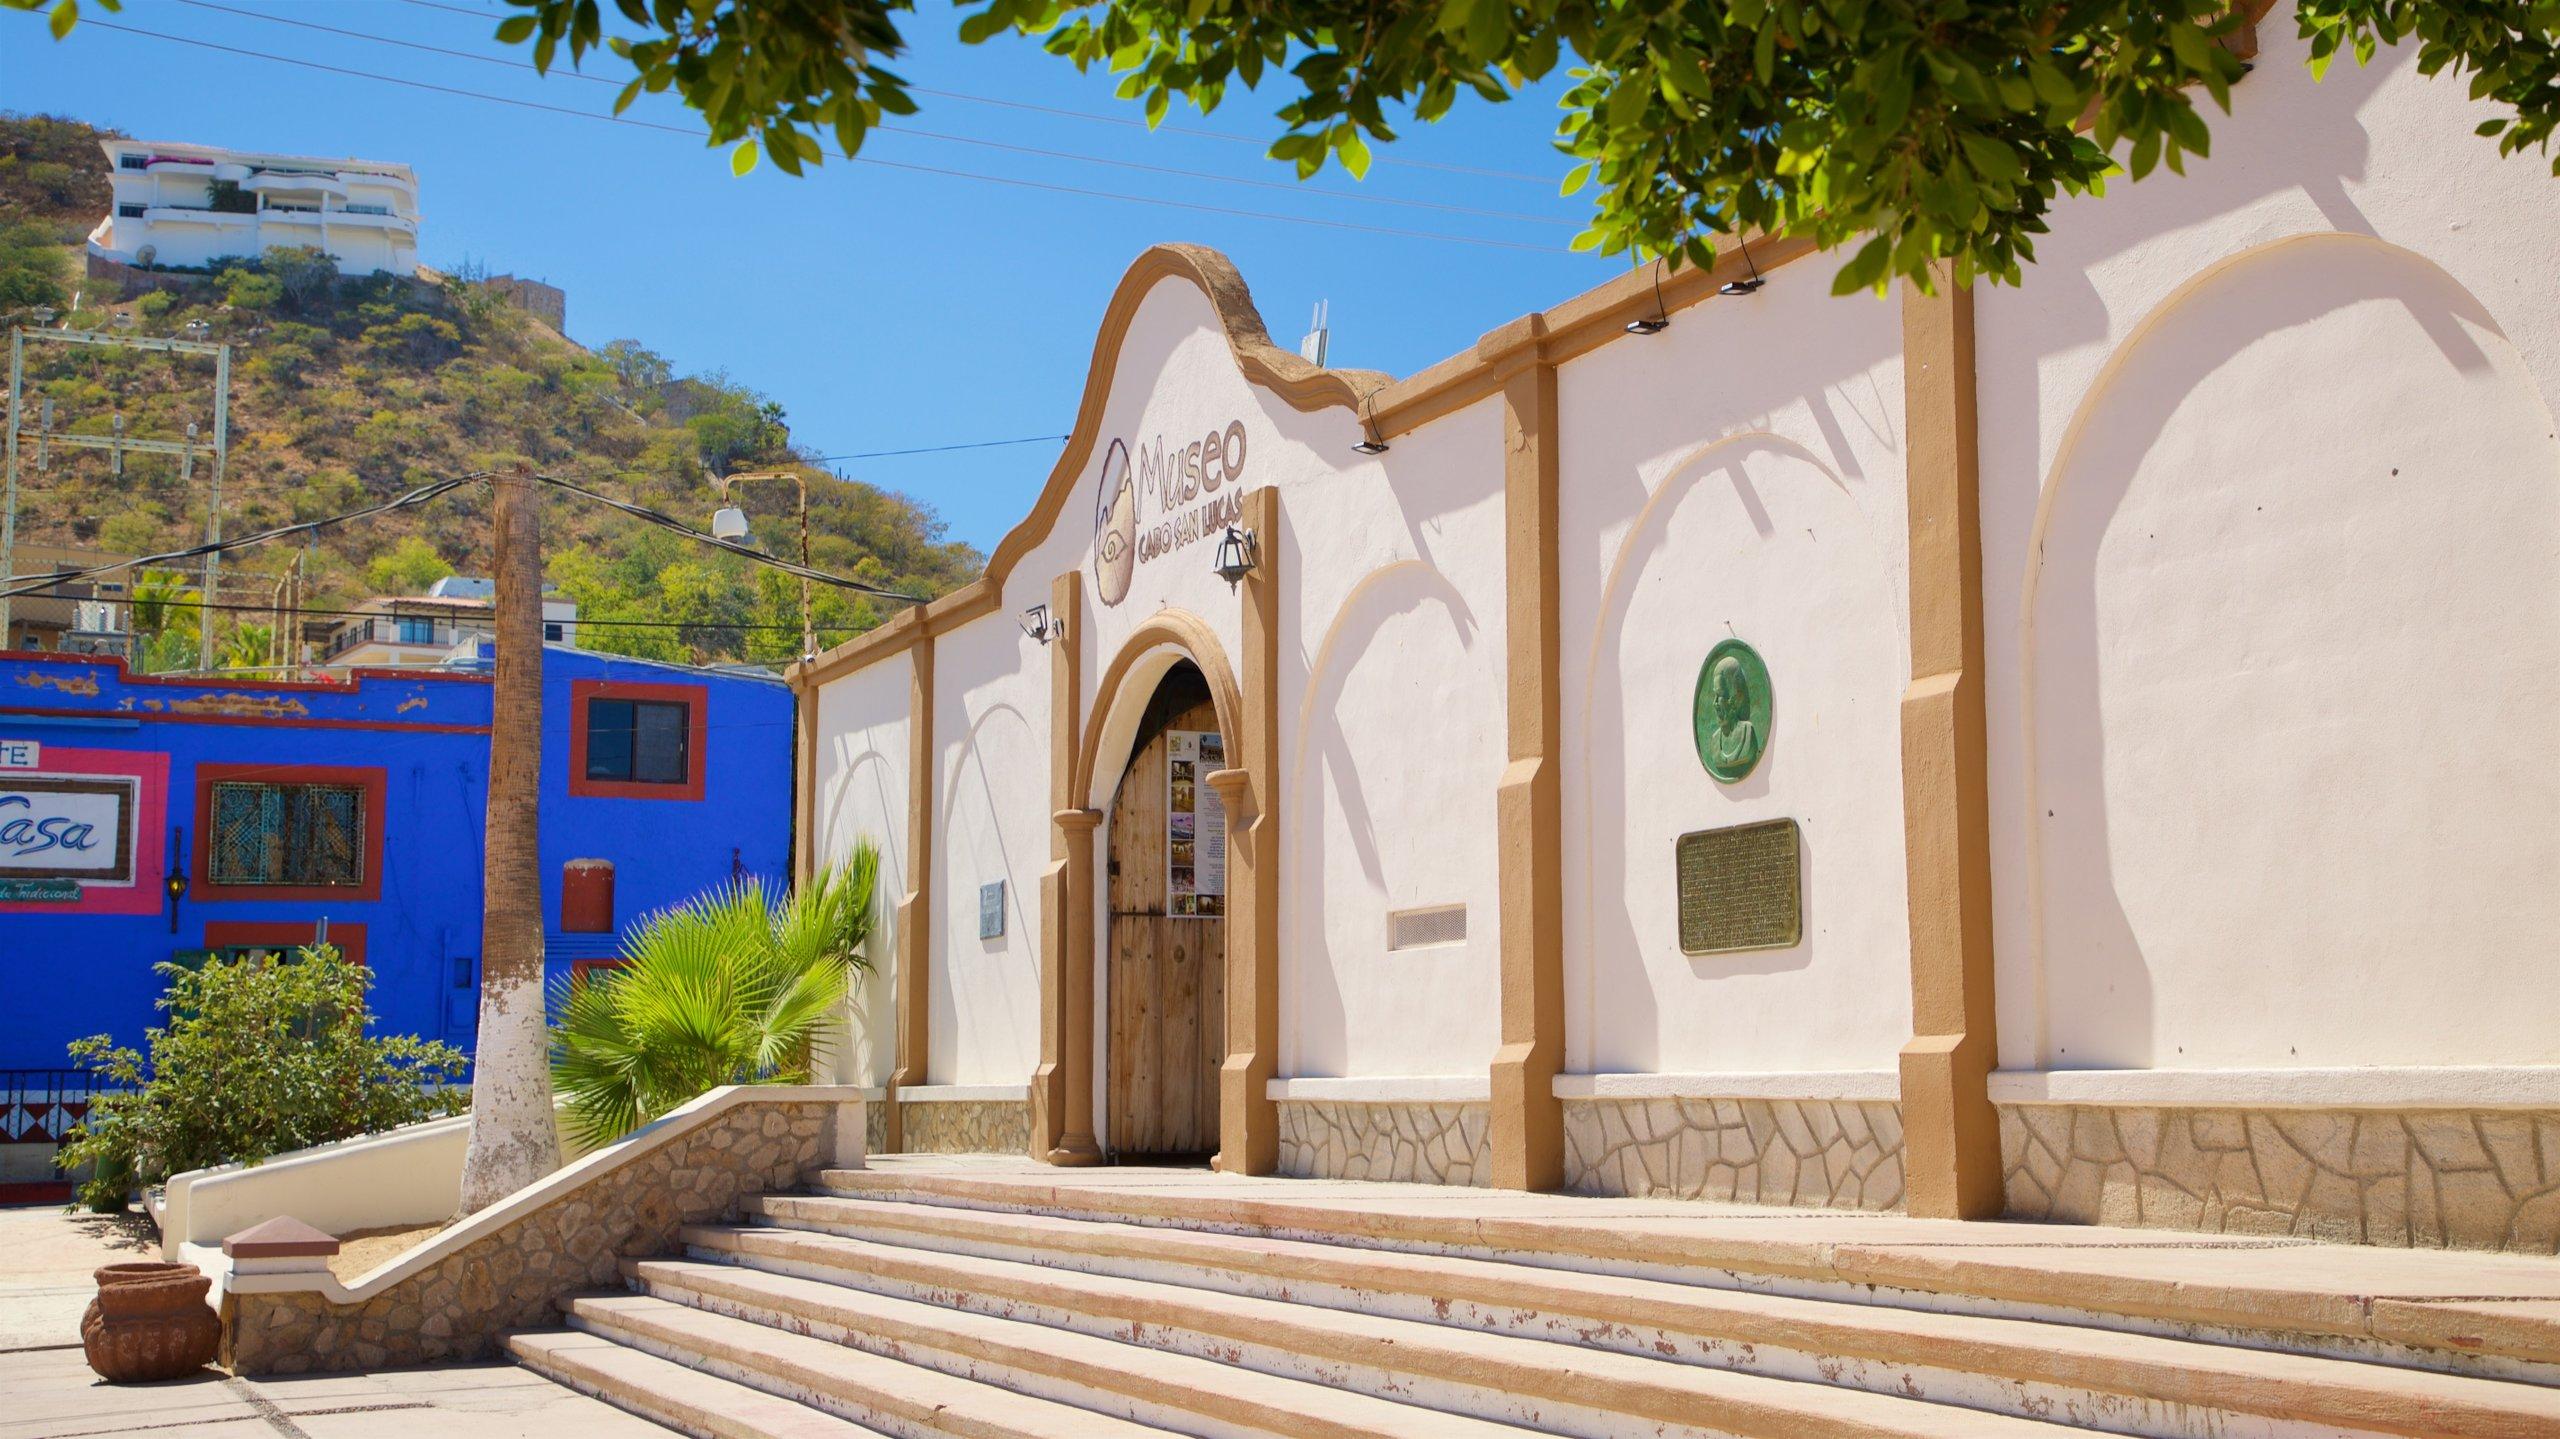 Naturkundemuseum von Cabo San Lucas, Los Cabos, Baja California Sur/Süden der Baja California, Mexiko